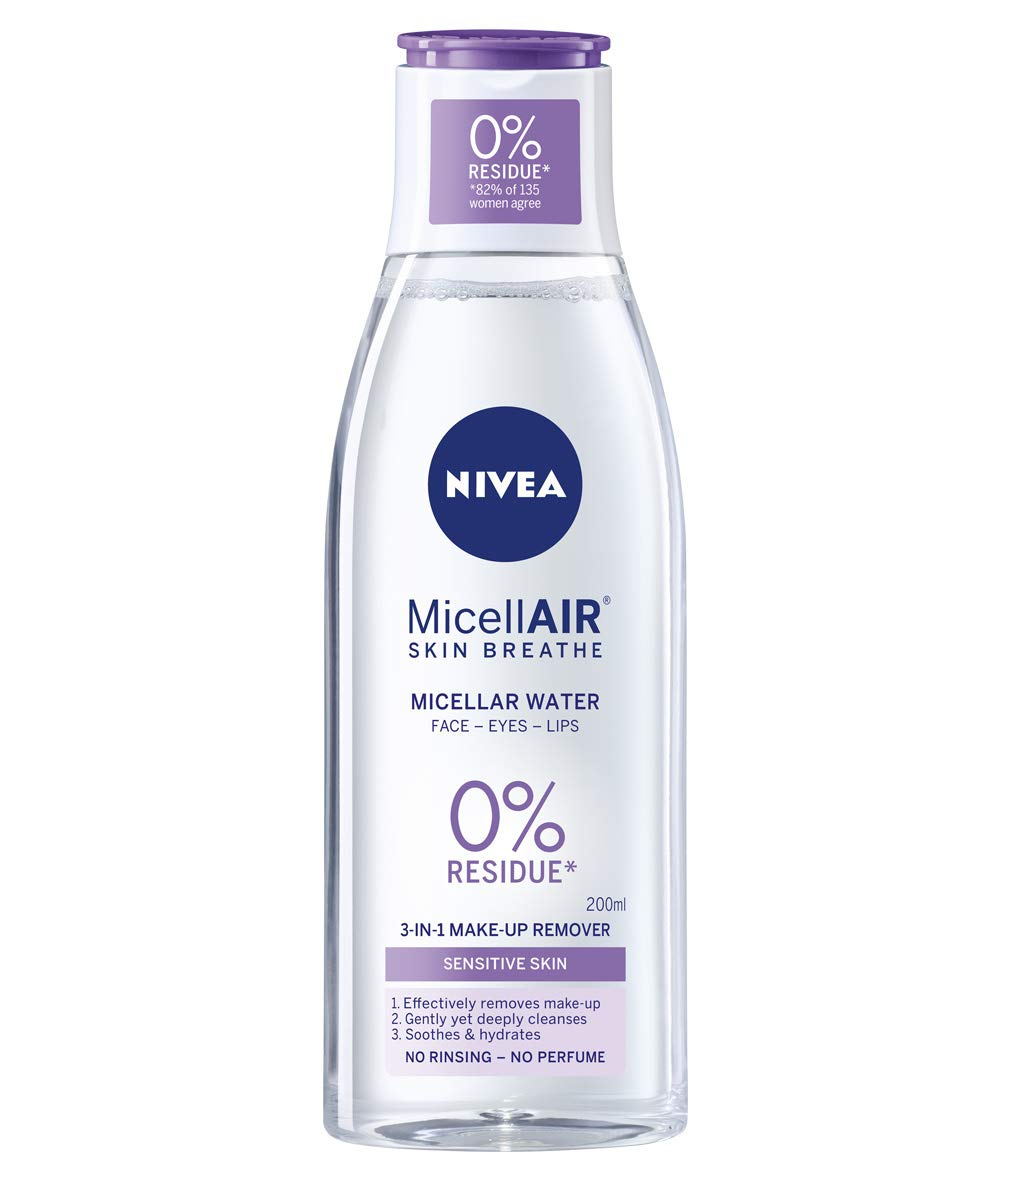 NIVEA MicellAIR Skin Breathe Micellar Water (200 ml), 3-in-1 Sensitive Make Up Remover, Micellar Cleaning Water, Gentle Moisturiser for Women